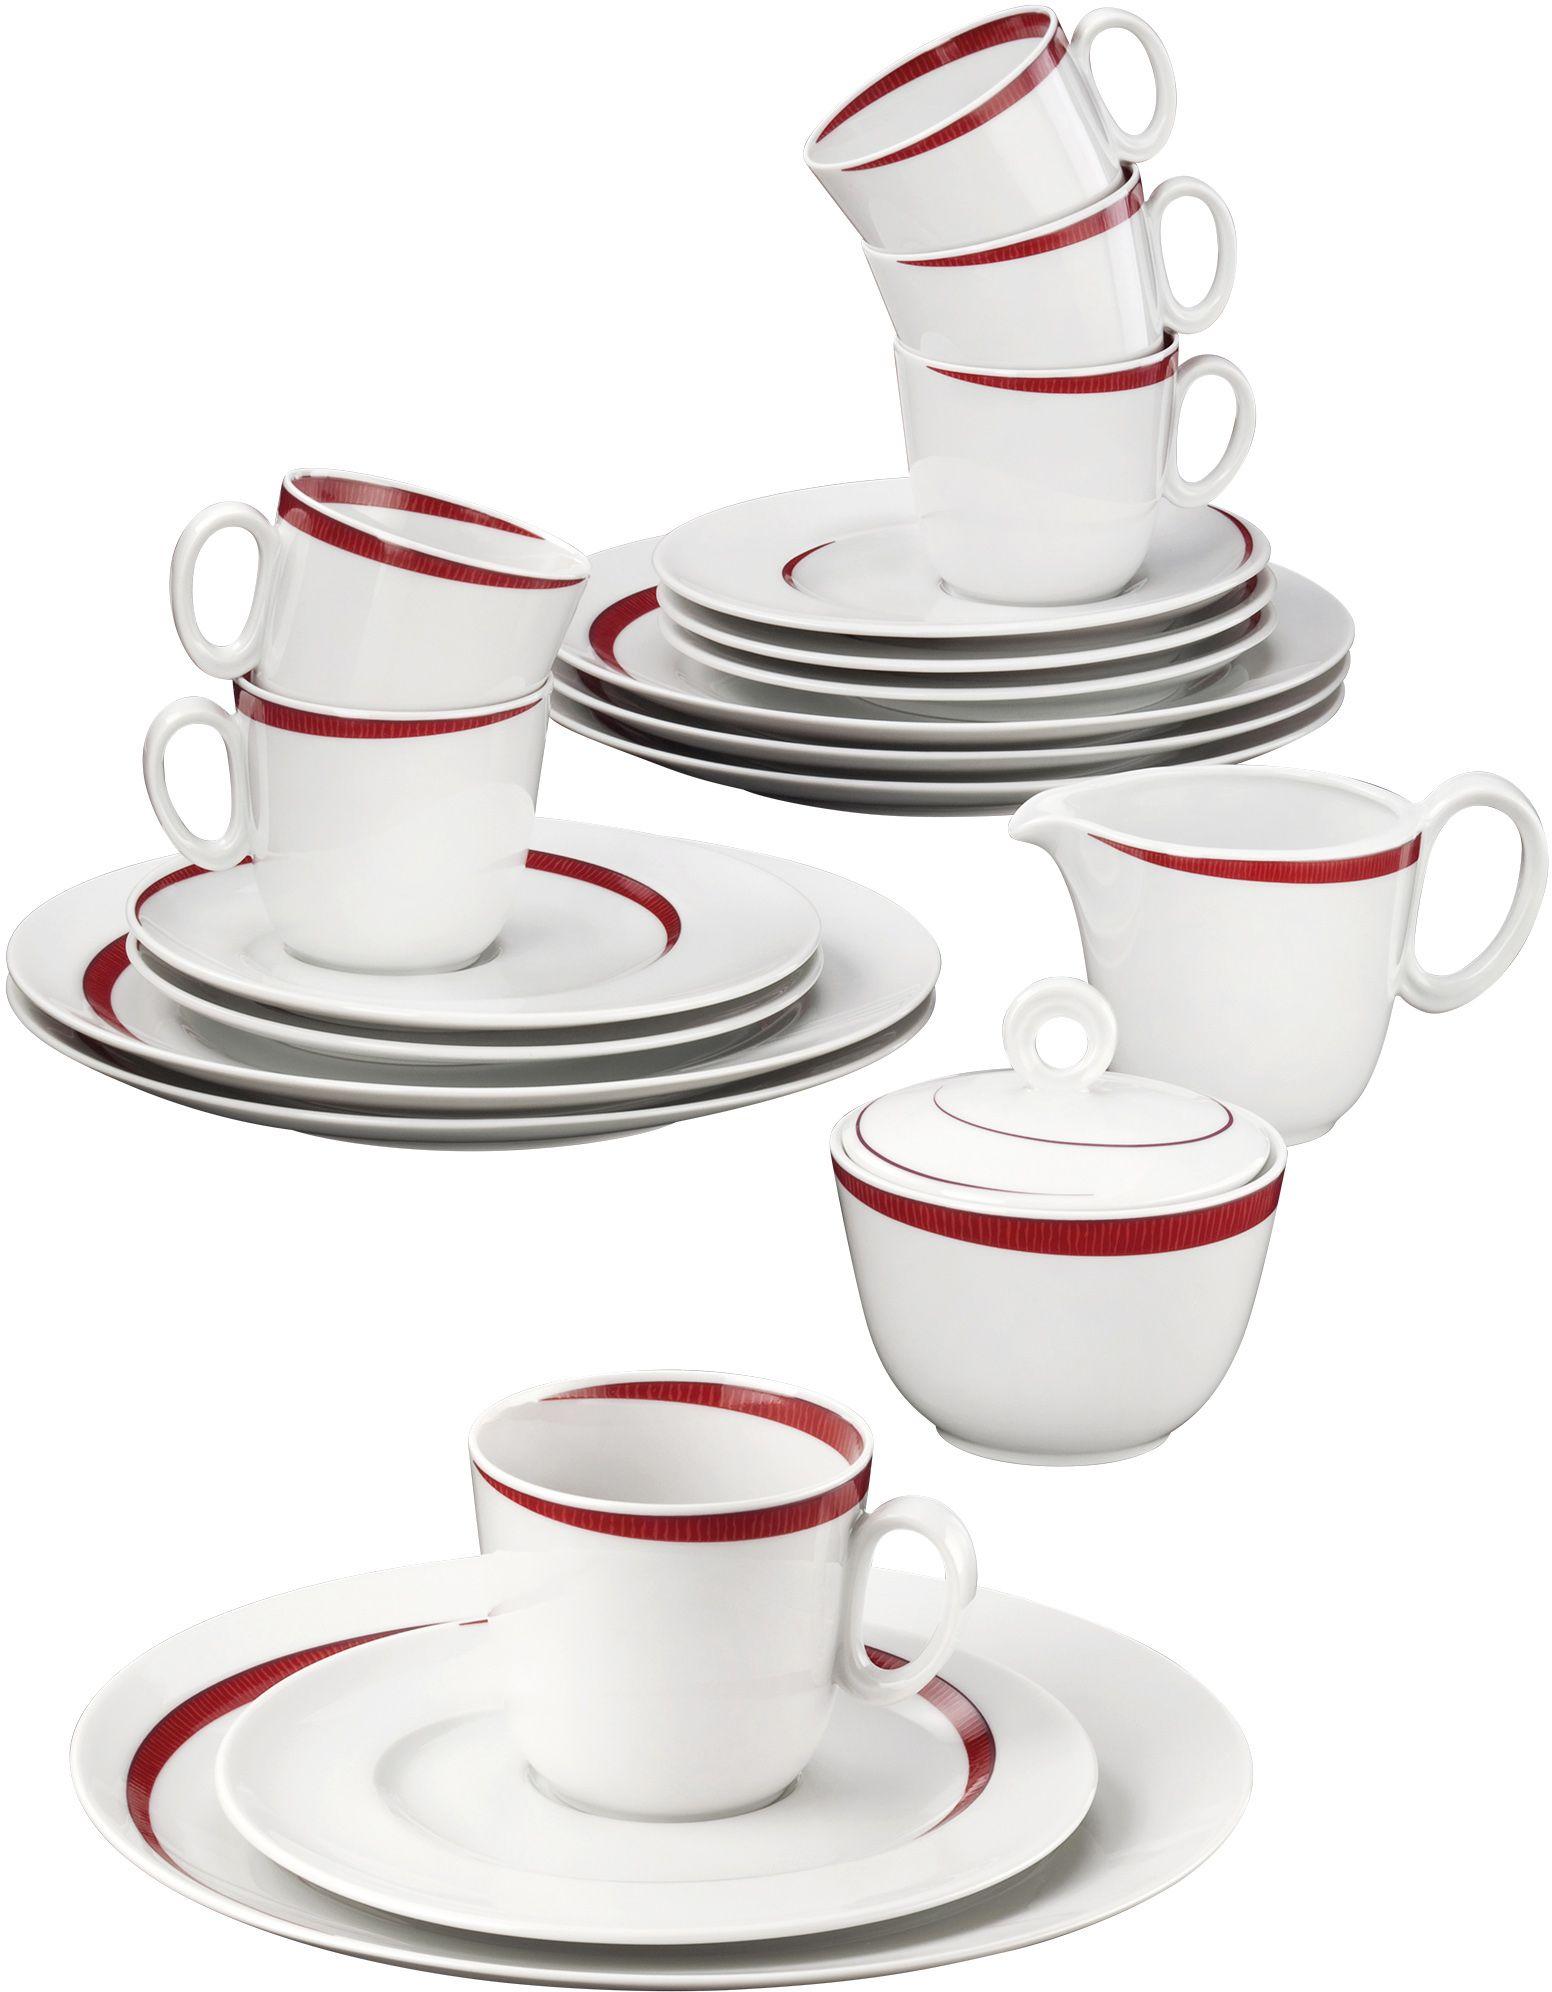 seltmann weiden kaffeeservice porzellan 20 teilig paso bossa nova schwab versand. Black Bedroom Furniture Sets. Home Design Ideas